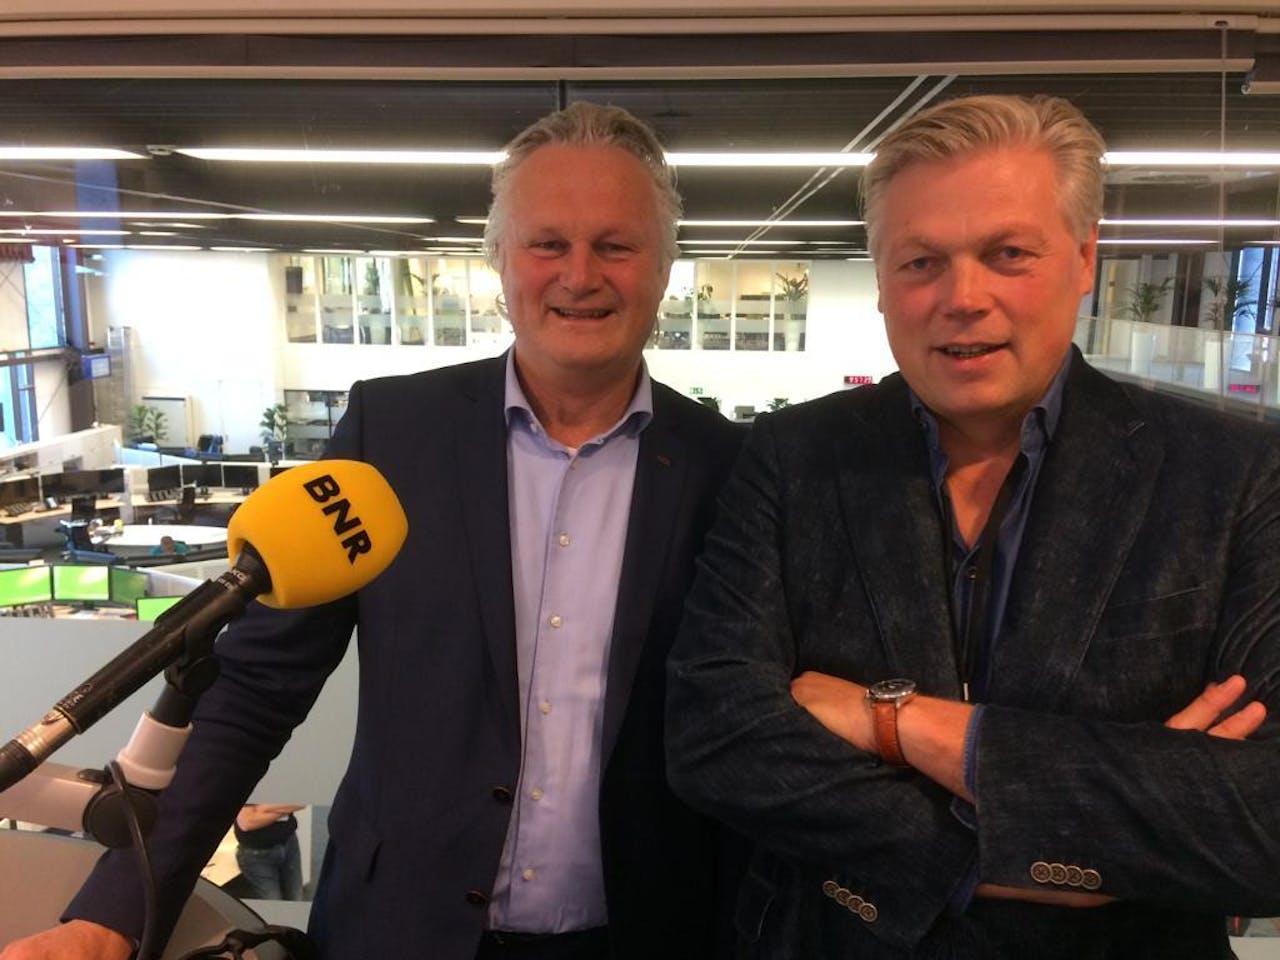 Roelof Hemmen & Pier Eringa, CEO van ProRail